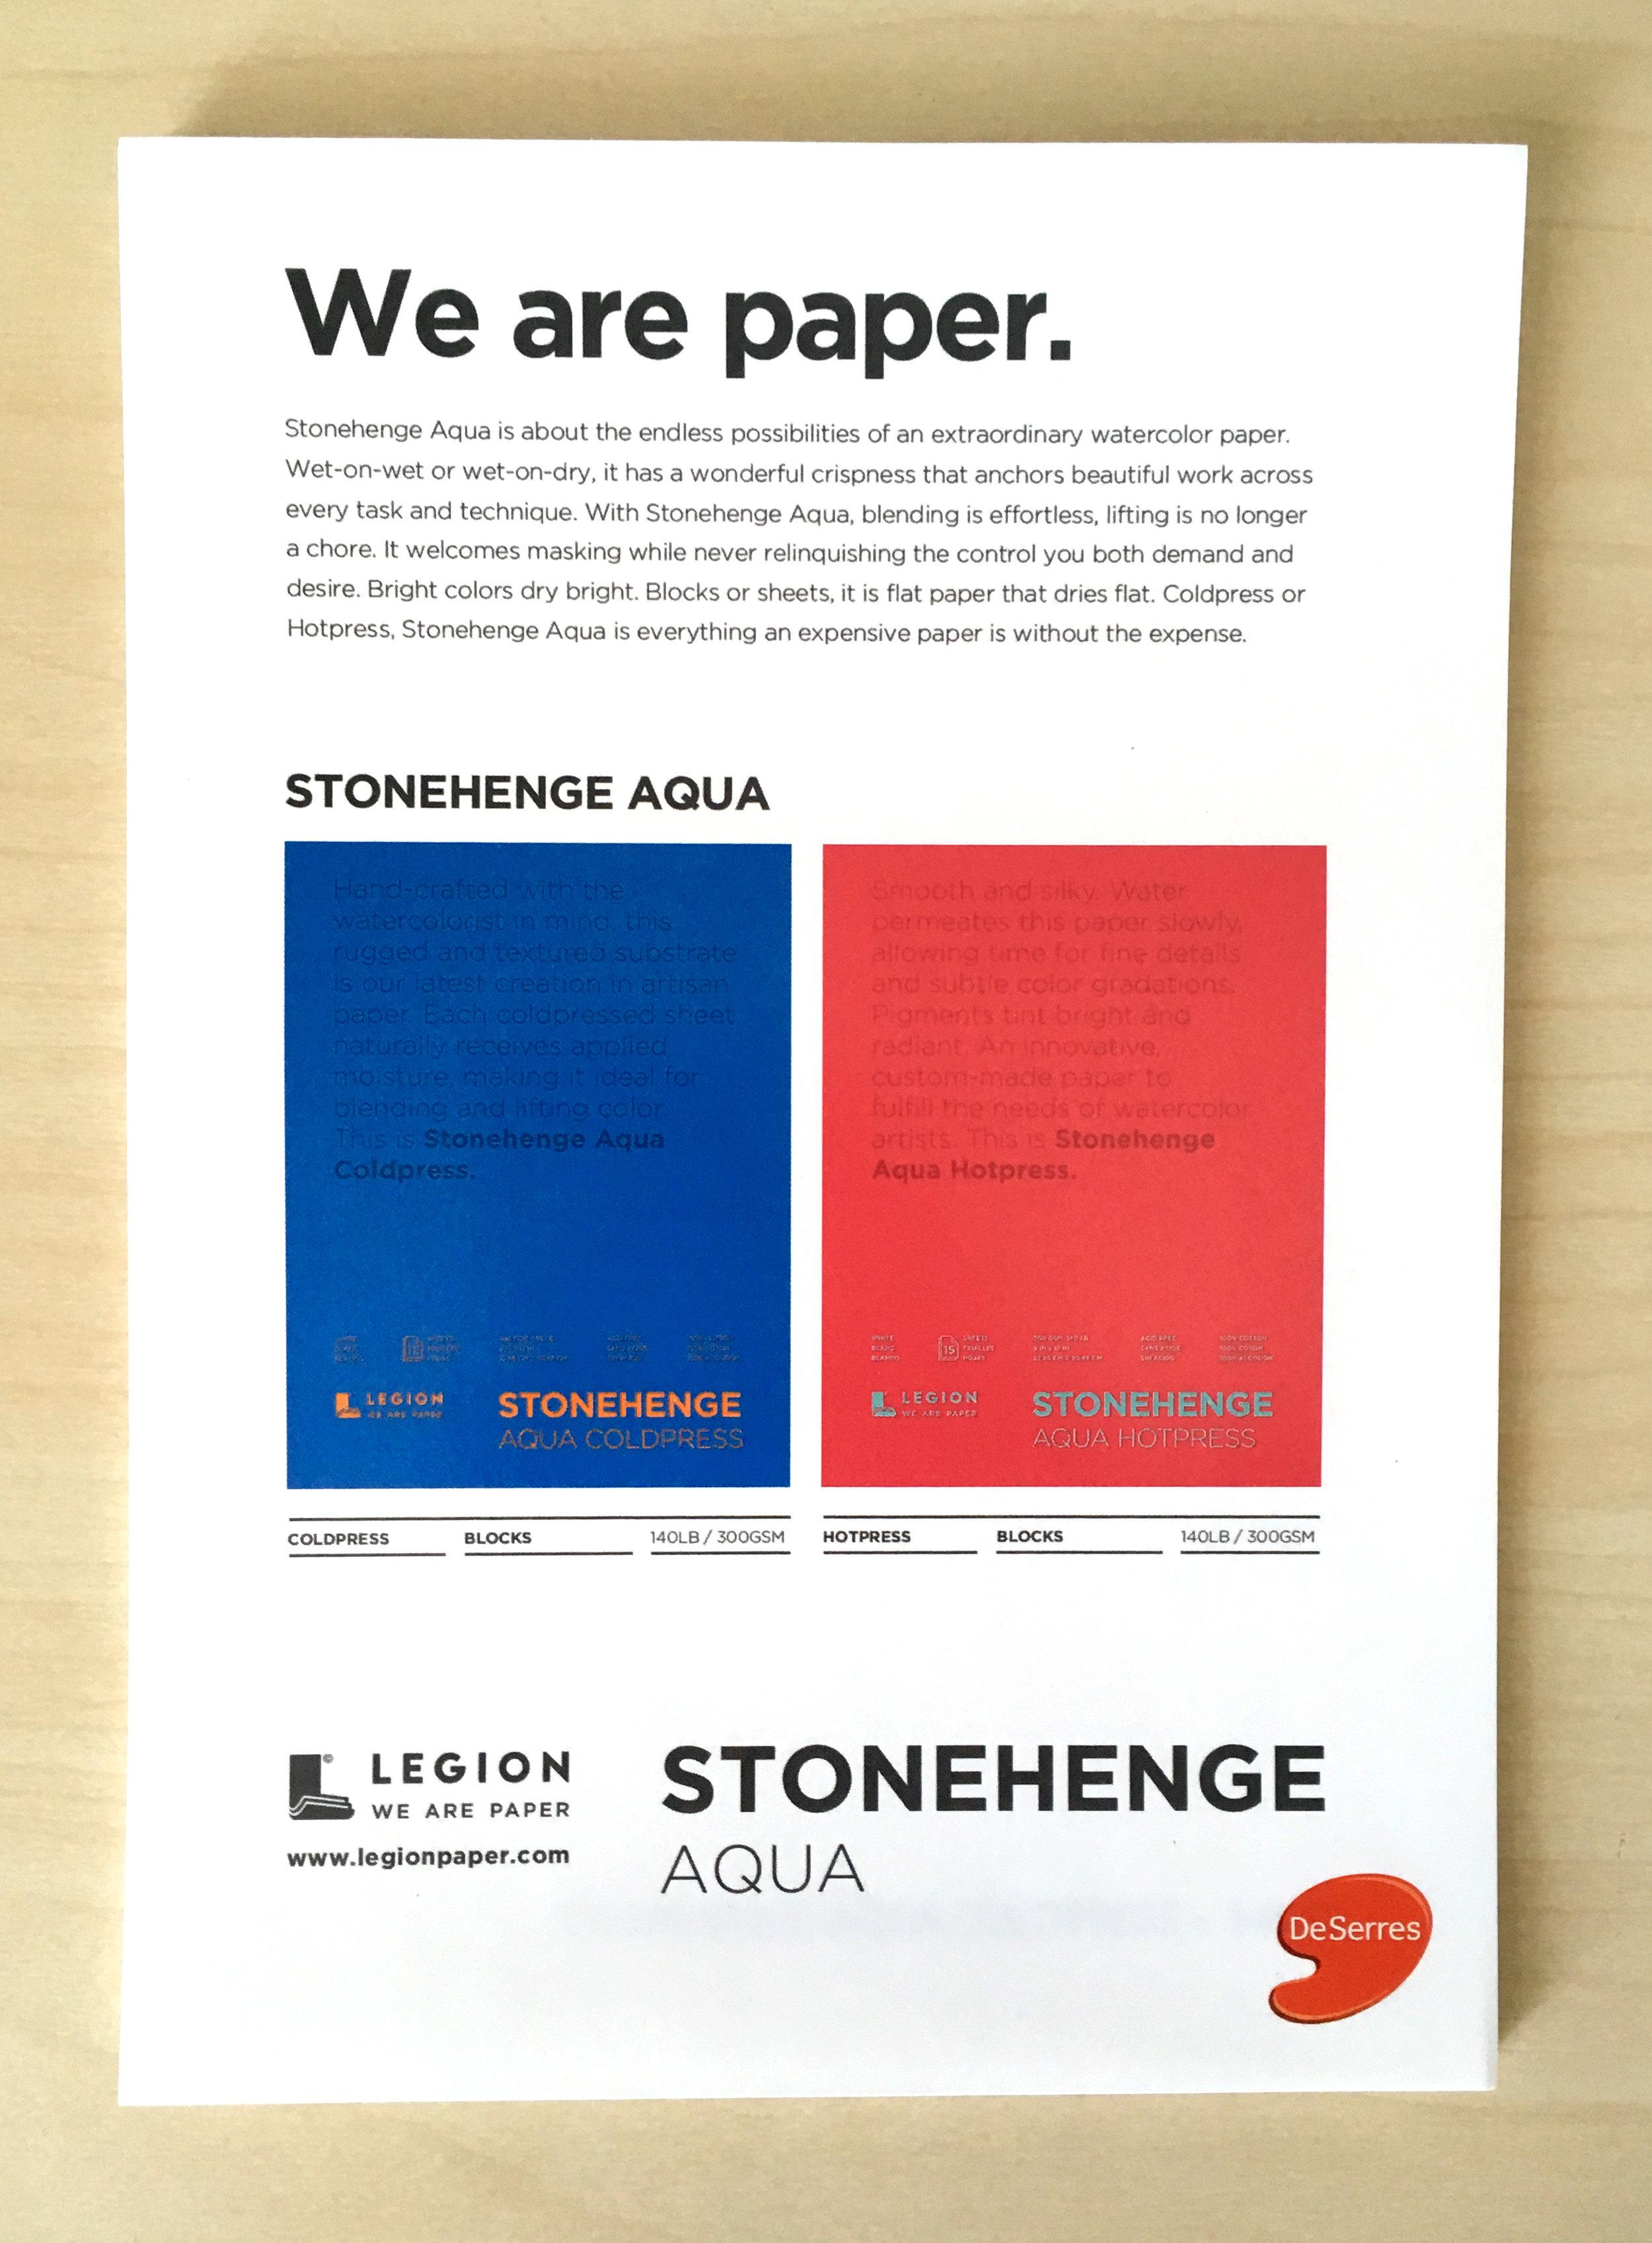 Legion_StonehengeAqua_Hotpress.jpg